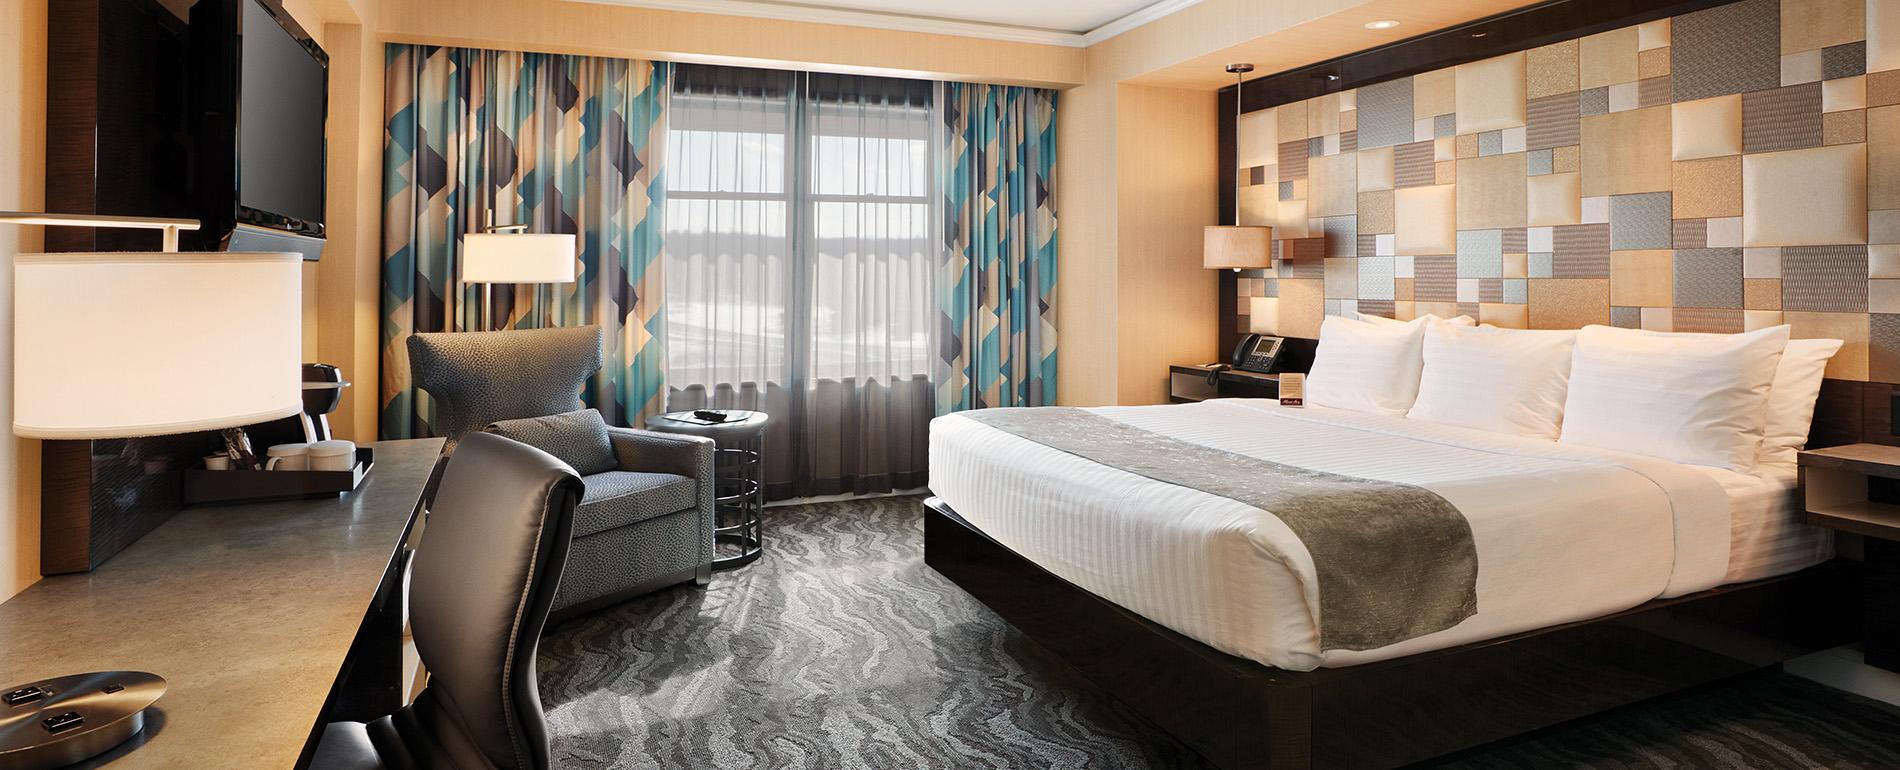 King Bed Room - Poconos Resort